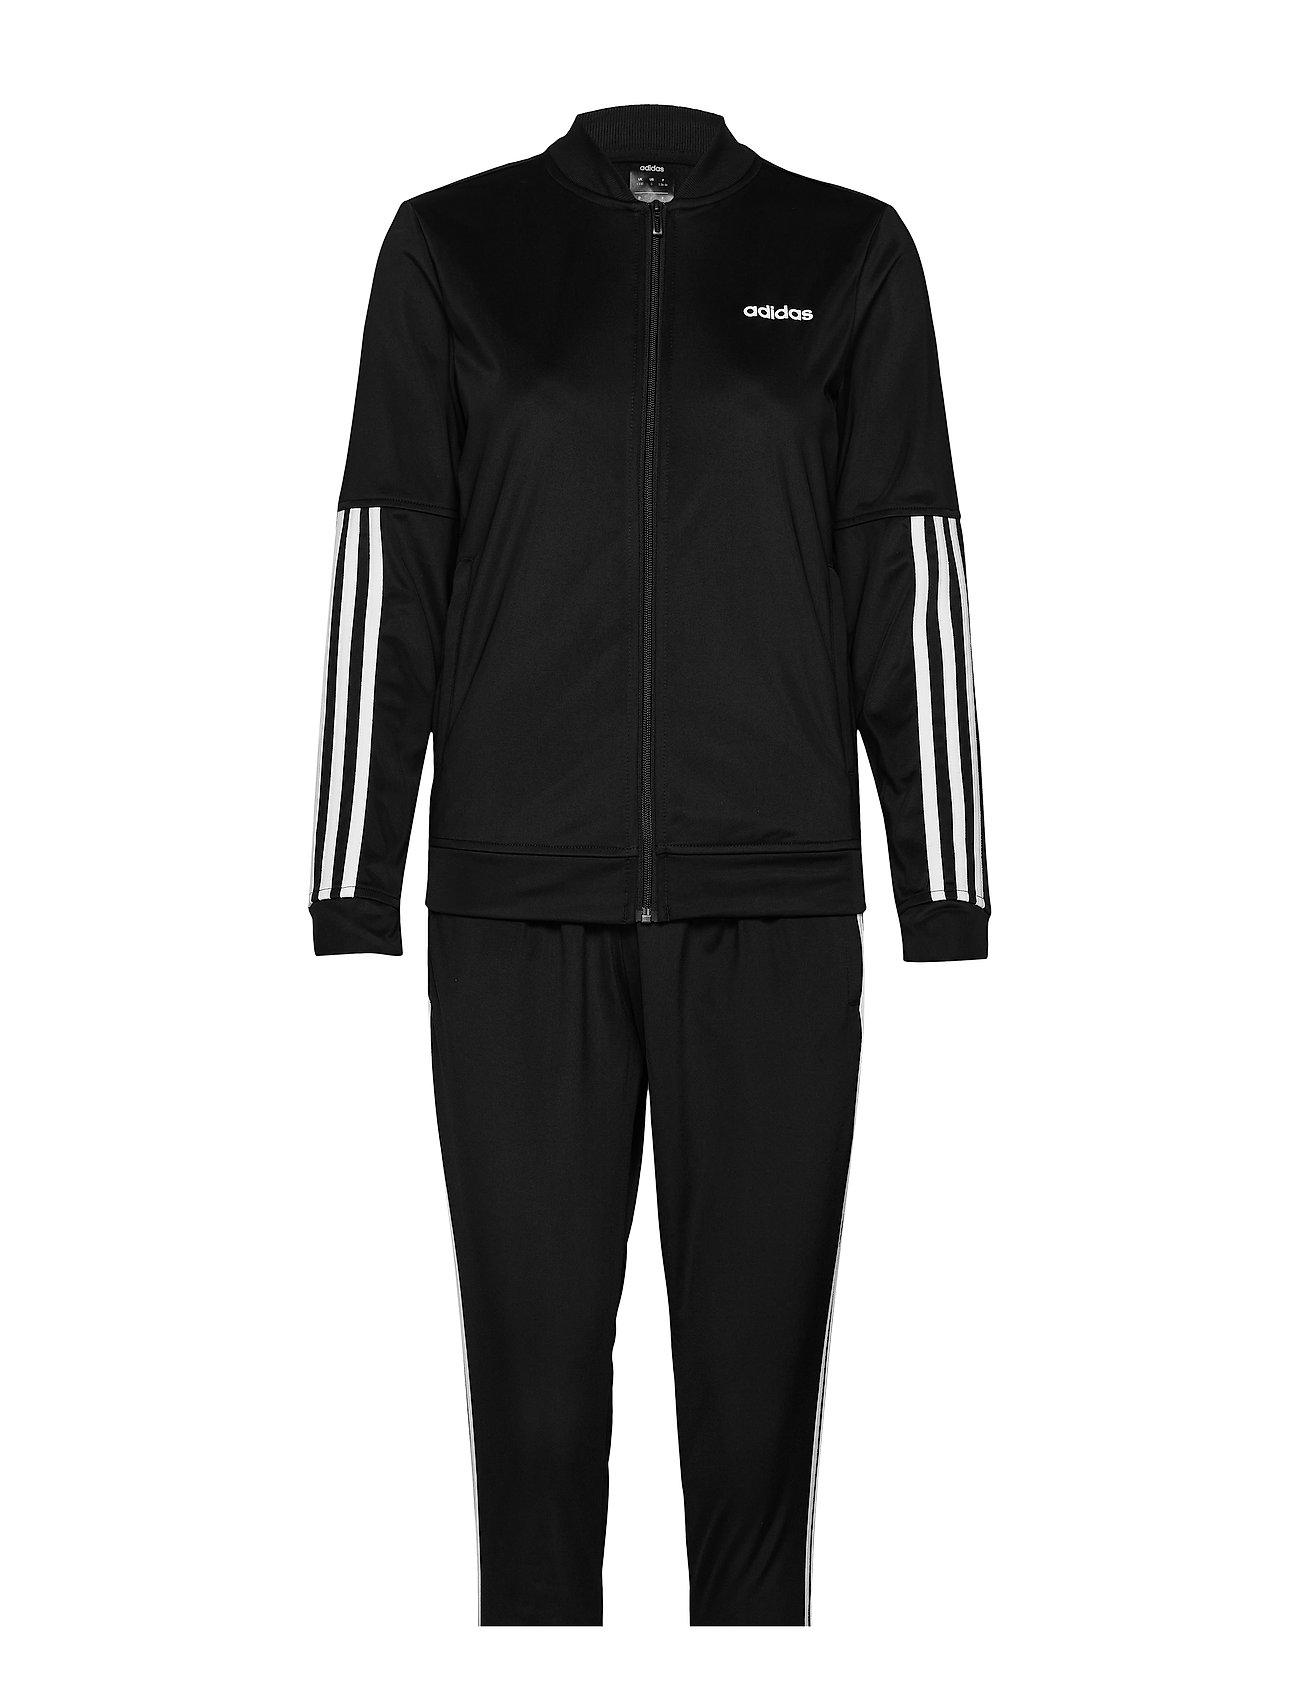 adidas Performance WTS BACK2BAS 3S - BLACK